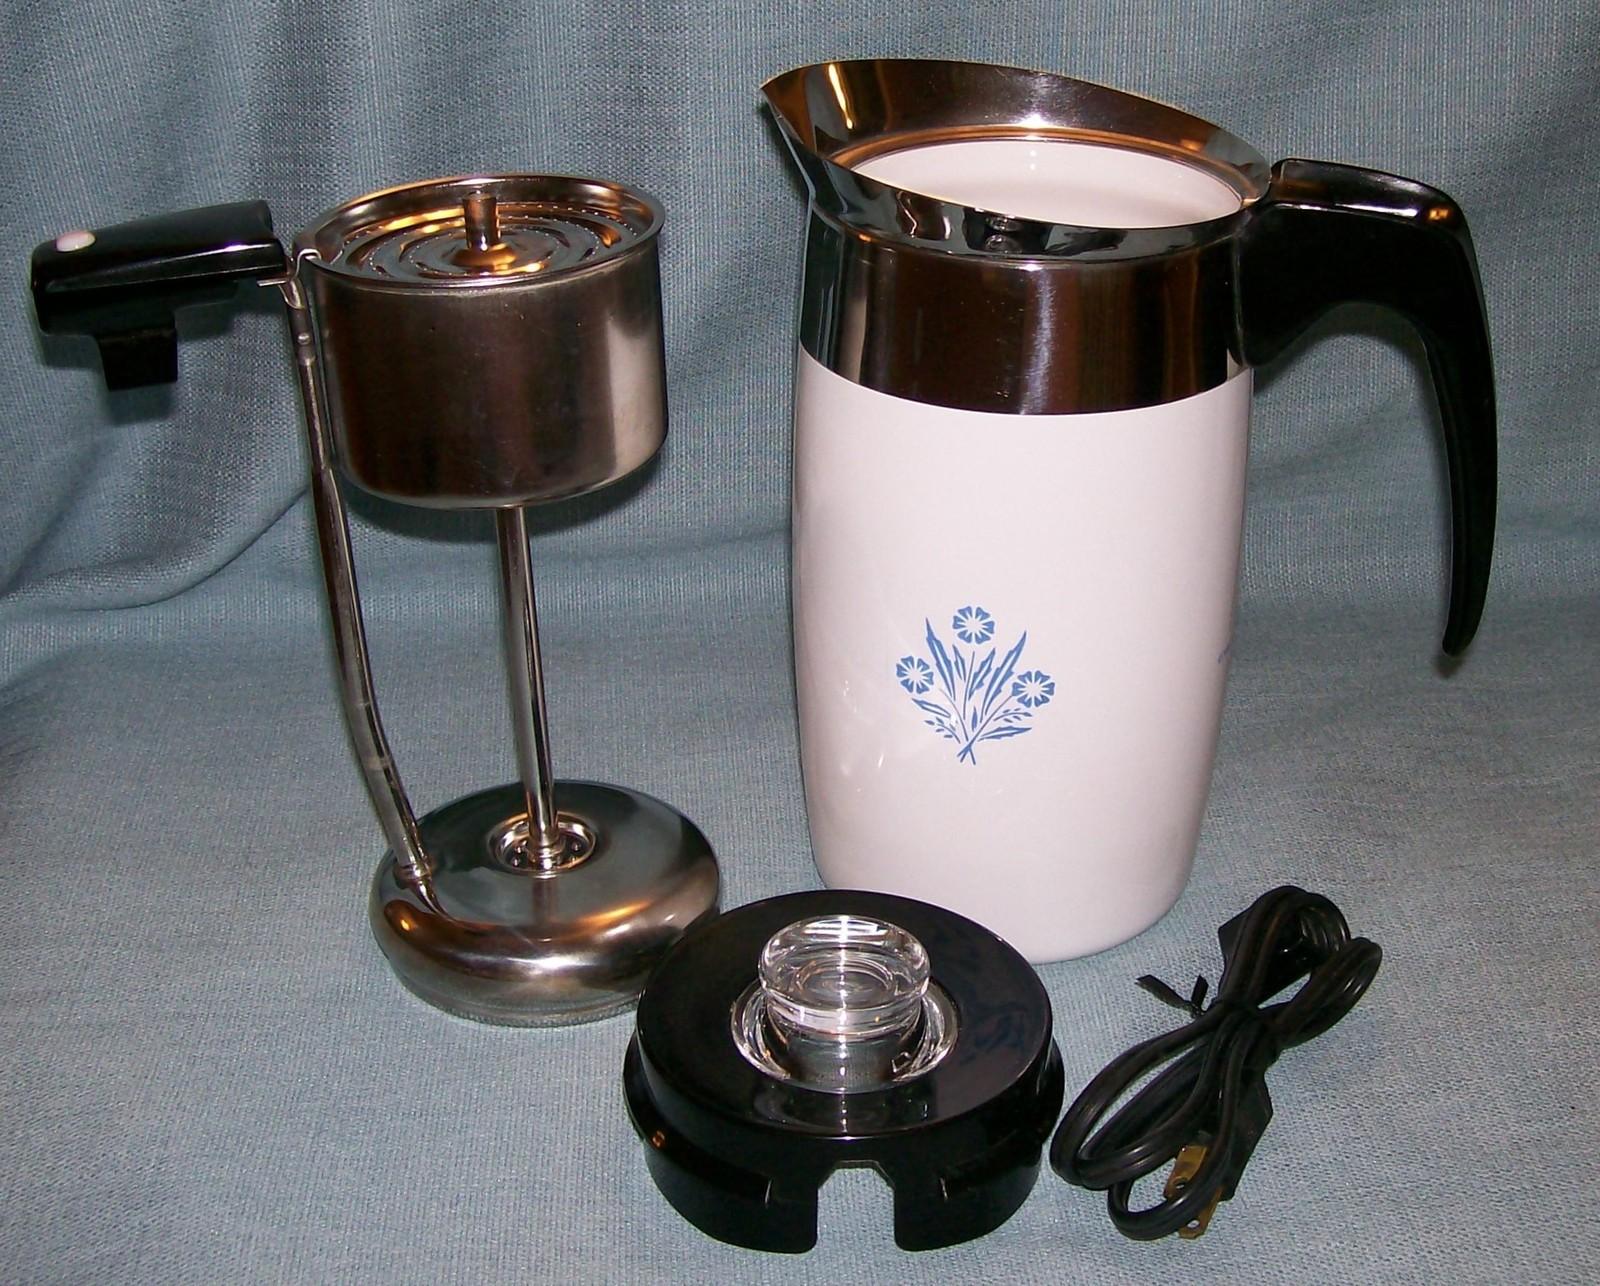 Corning Ware BLUE CORNFLOWER Electric Coffee Pot/Percolator 6 cup P-6-EP VGVC